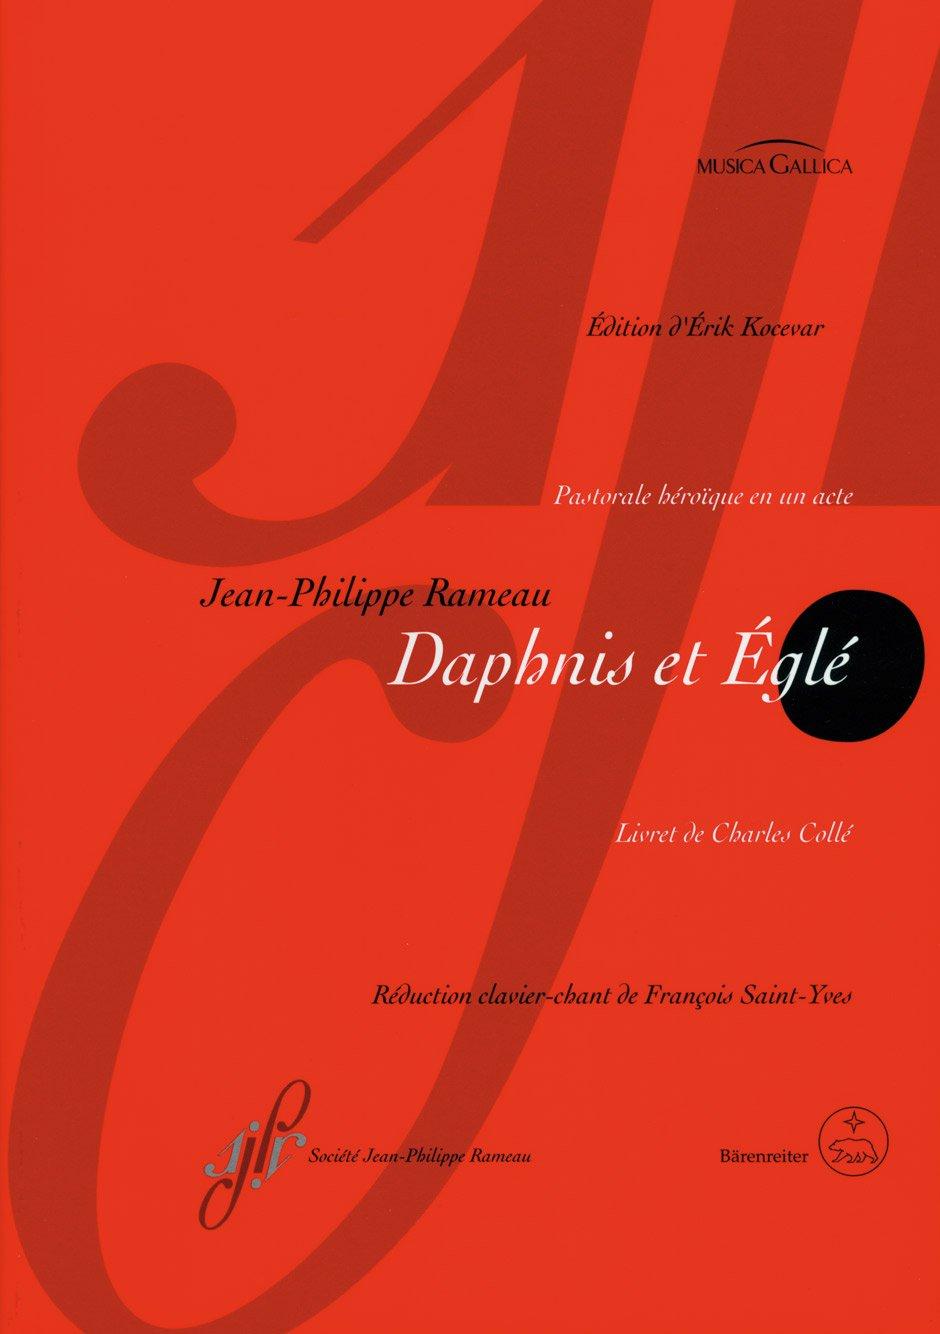 Daphnis et Egle